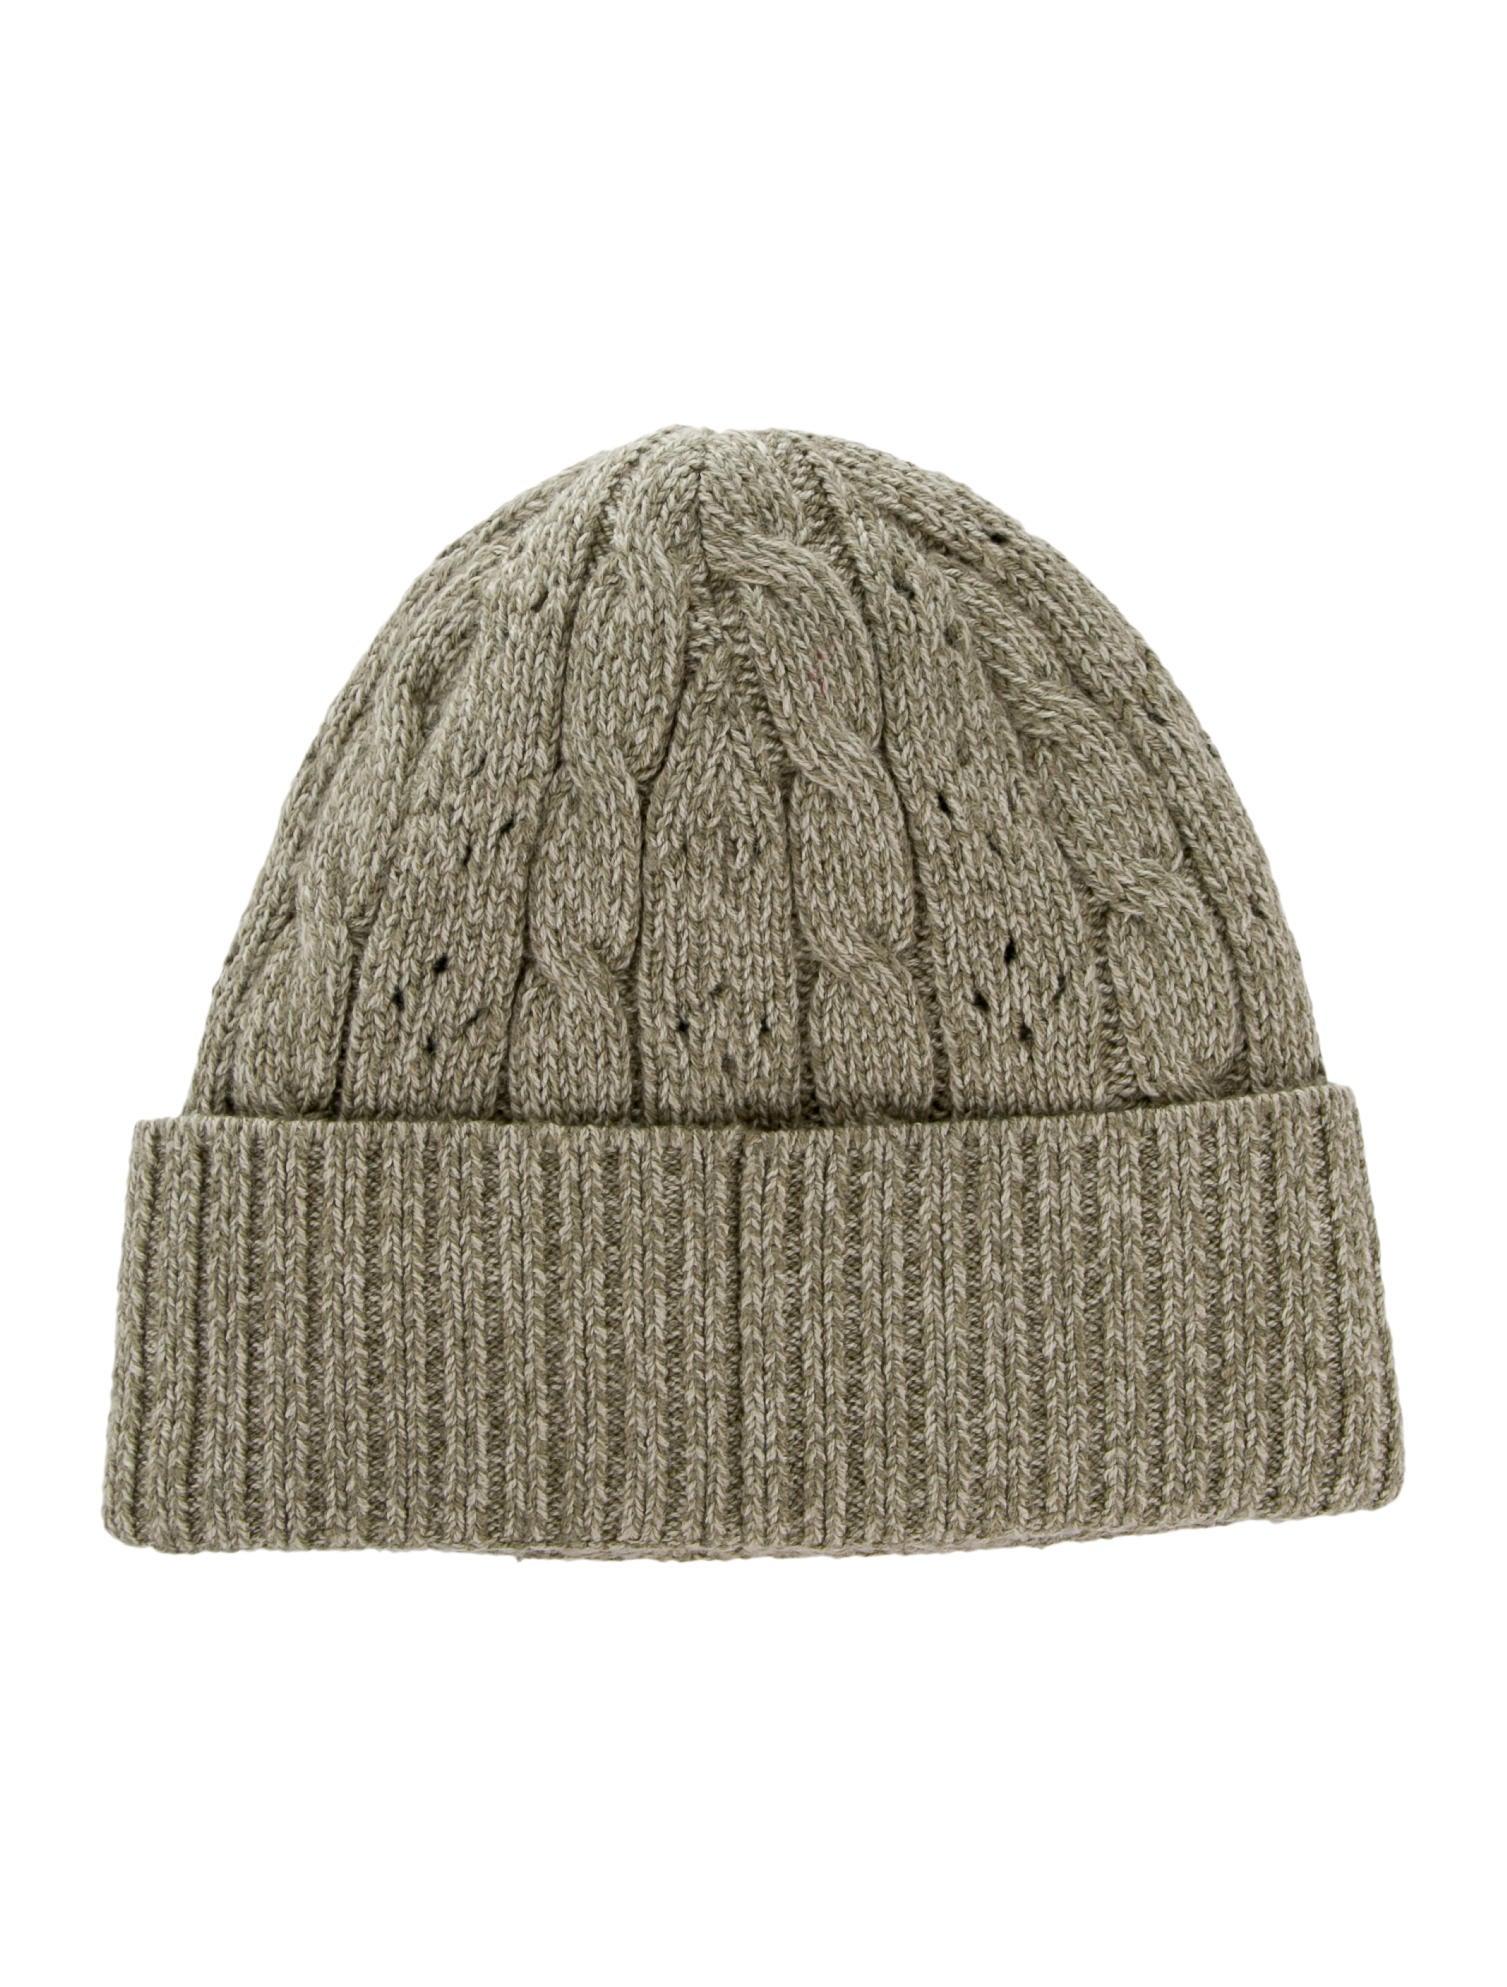 Knit Rib Stitch Hat : Stella McCartney for Adidas Rib Knit Beanie Hat - Accessories - W5S21200 Th...